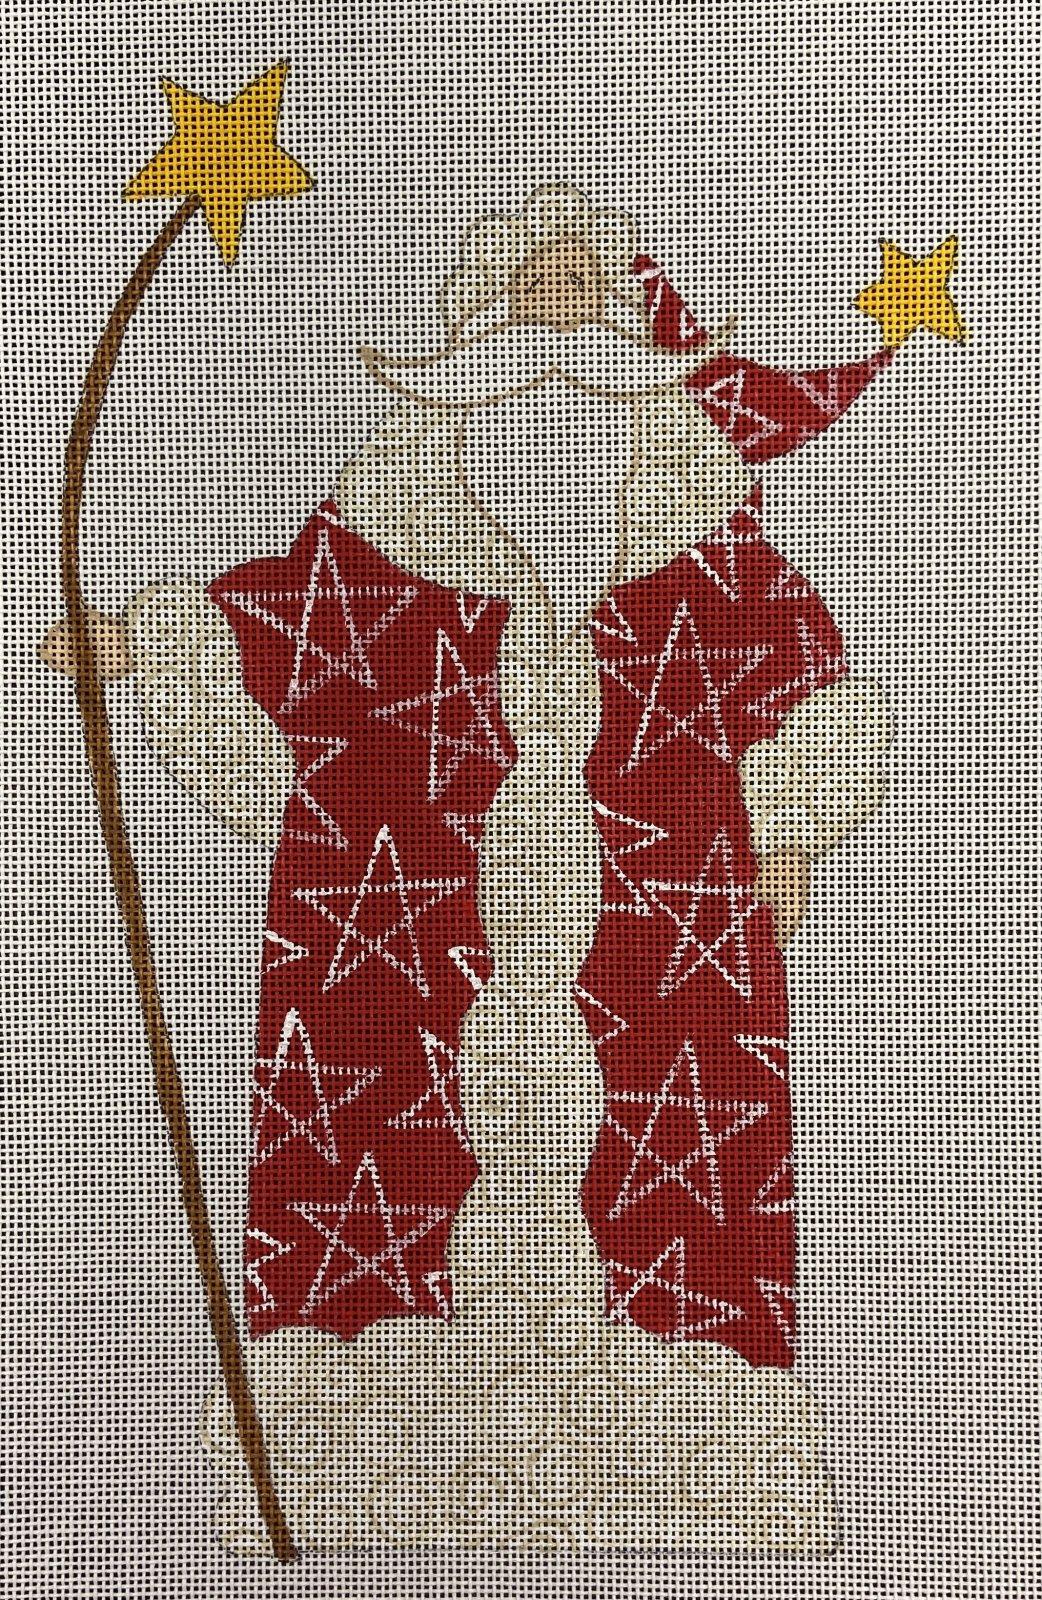 CB Santa Red Coat with Star Fleur de Paris